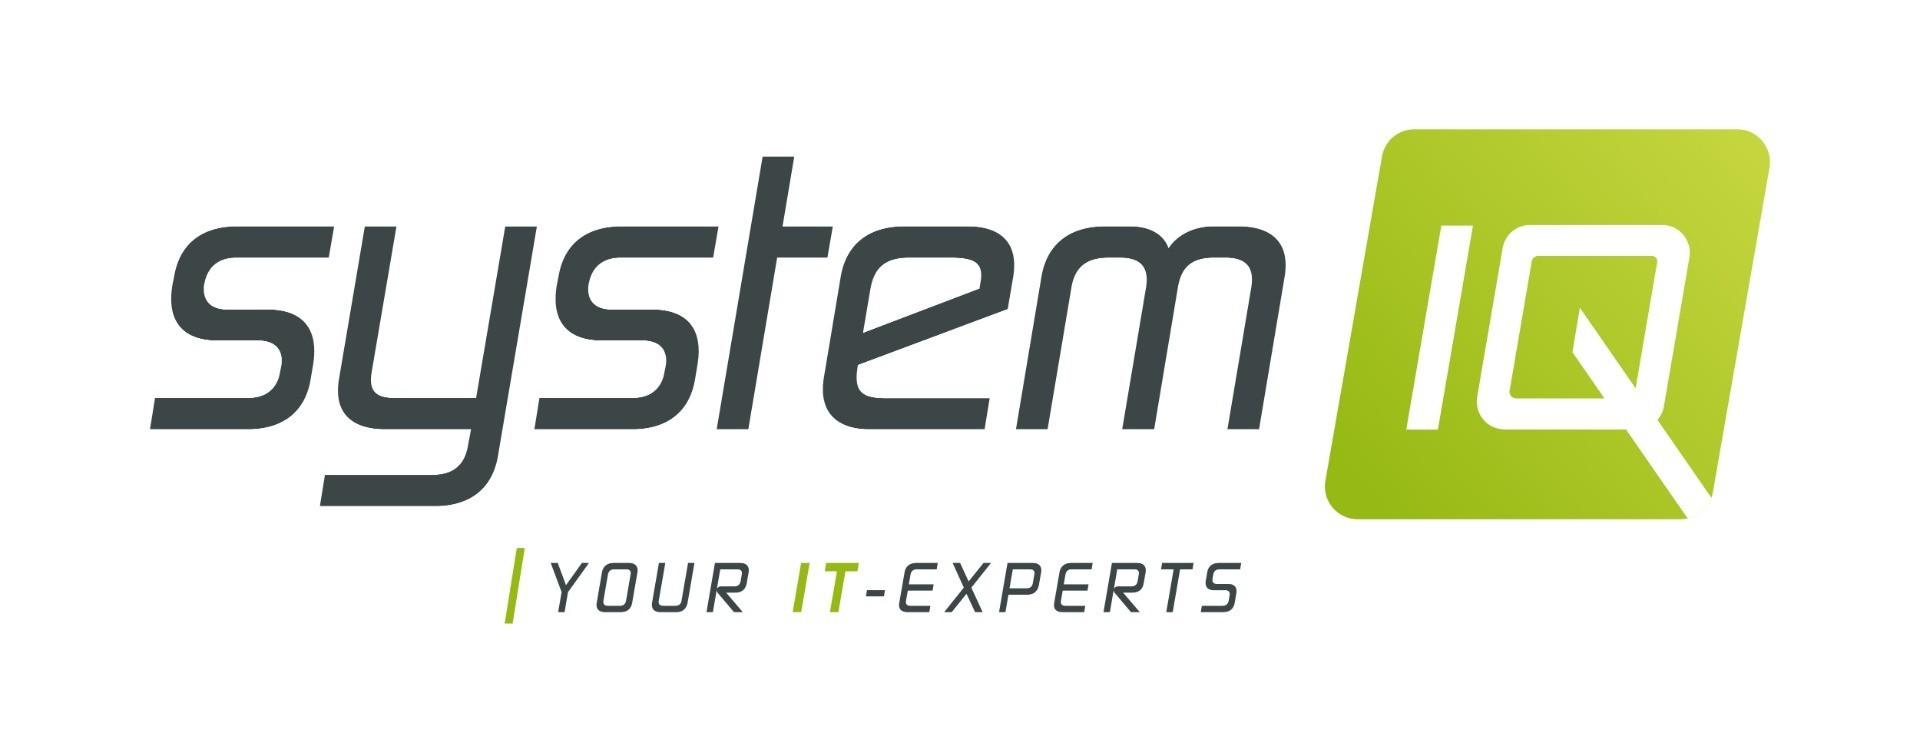 softsolution_systemiq logo.jpg